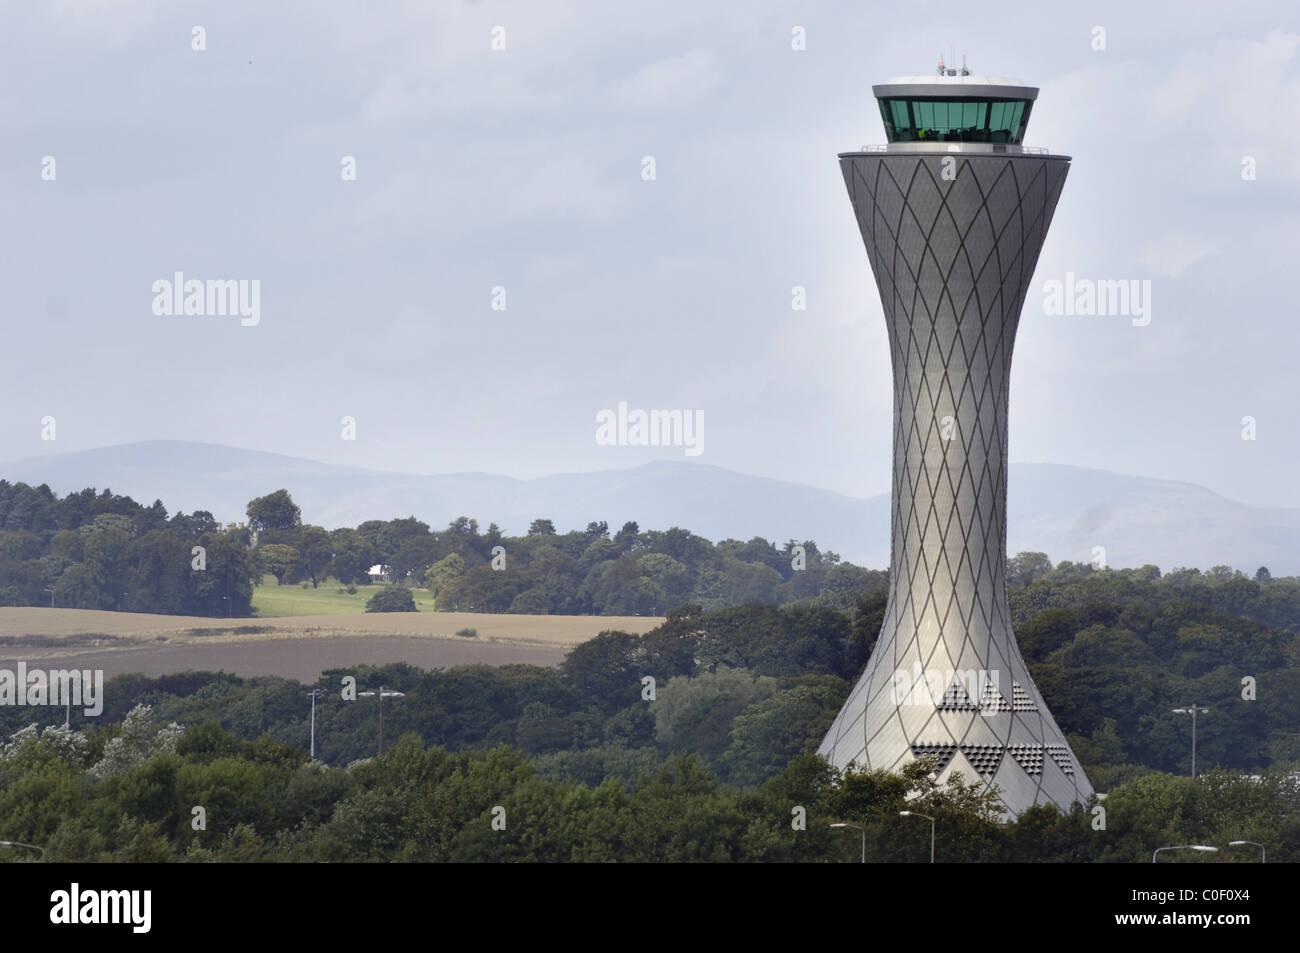 AIR TRAFFIC CONTROL TOWER, EDINBURGH AIRPORT, EDINBURGH, MID LOATHIAN, UNITED KINGDOM, Stock Photo